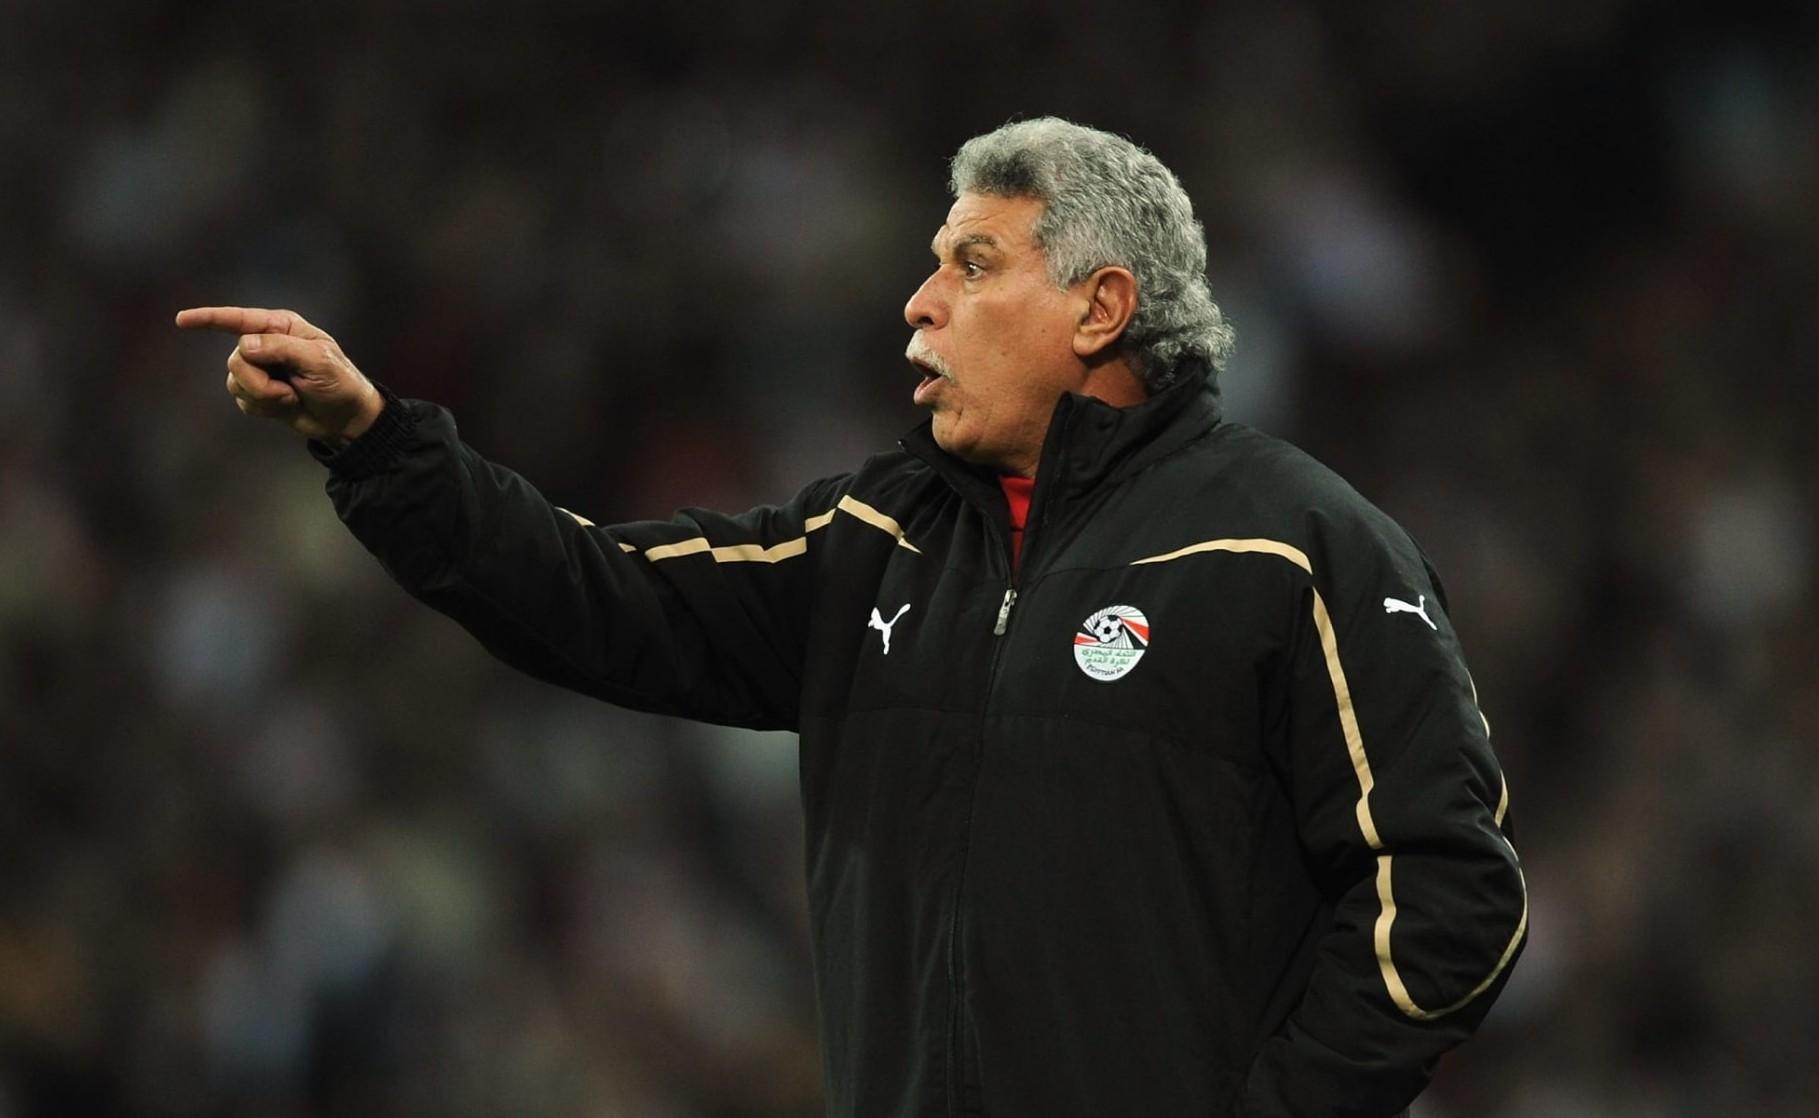 Hassan Shehata Poised for Return as Egypt's National Football Team Manager